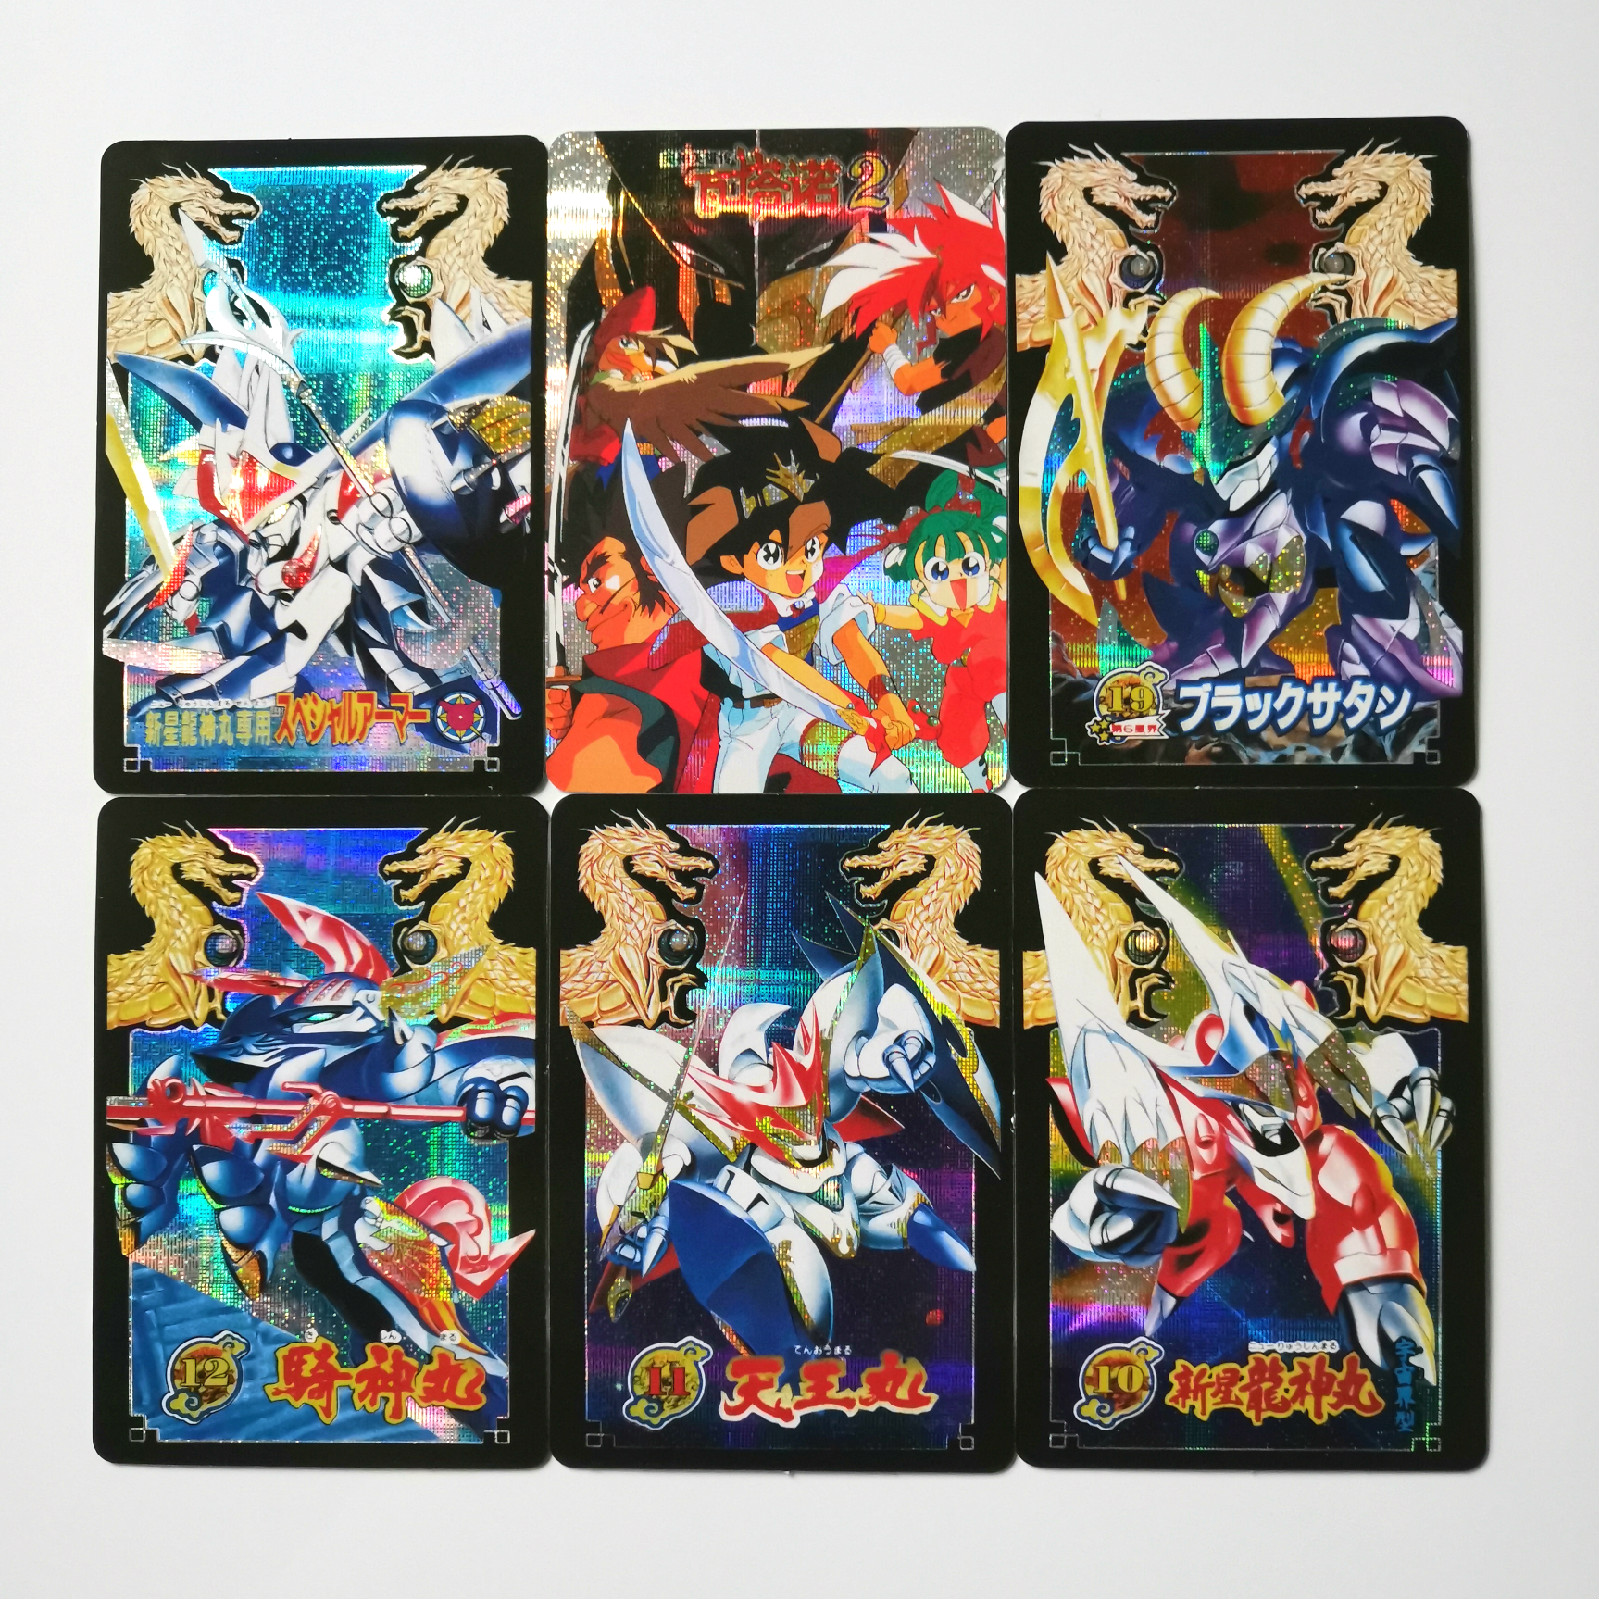 22 pcs set de toycard majin eiyuuden wataru hobbies brinquedos passatempo colecionaveis jogo colecao anime cartoes